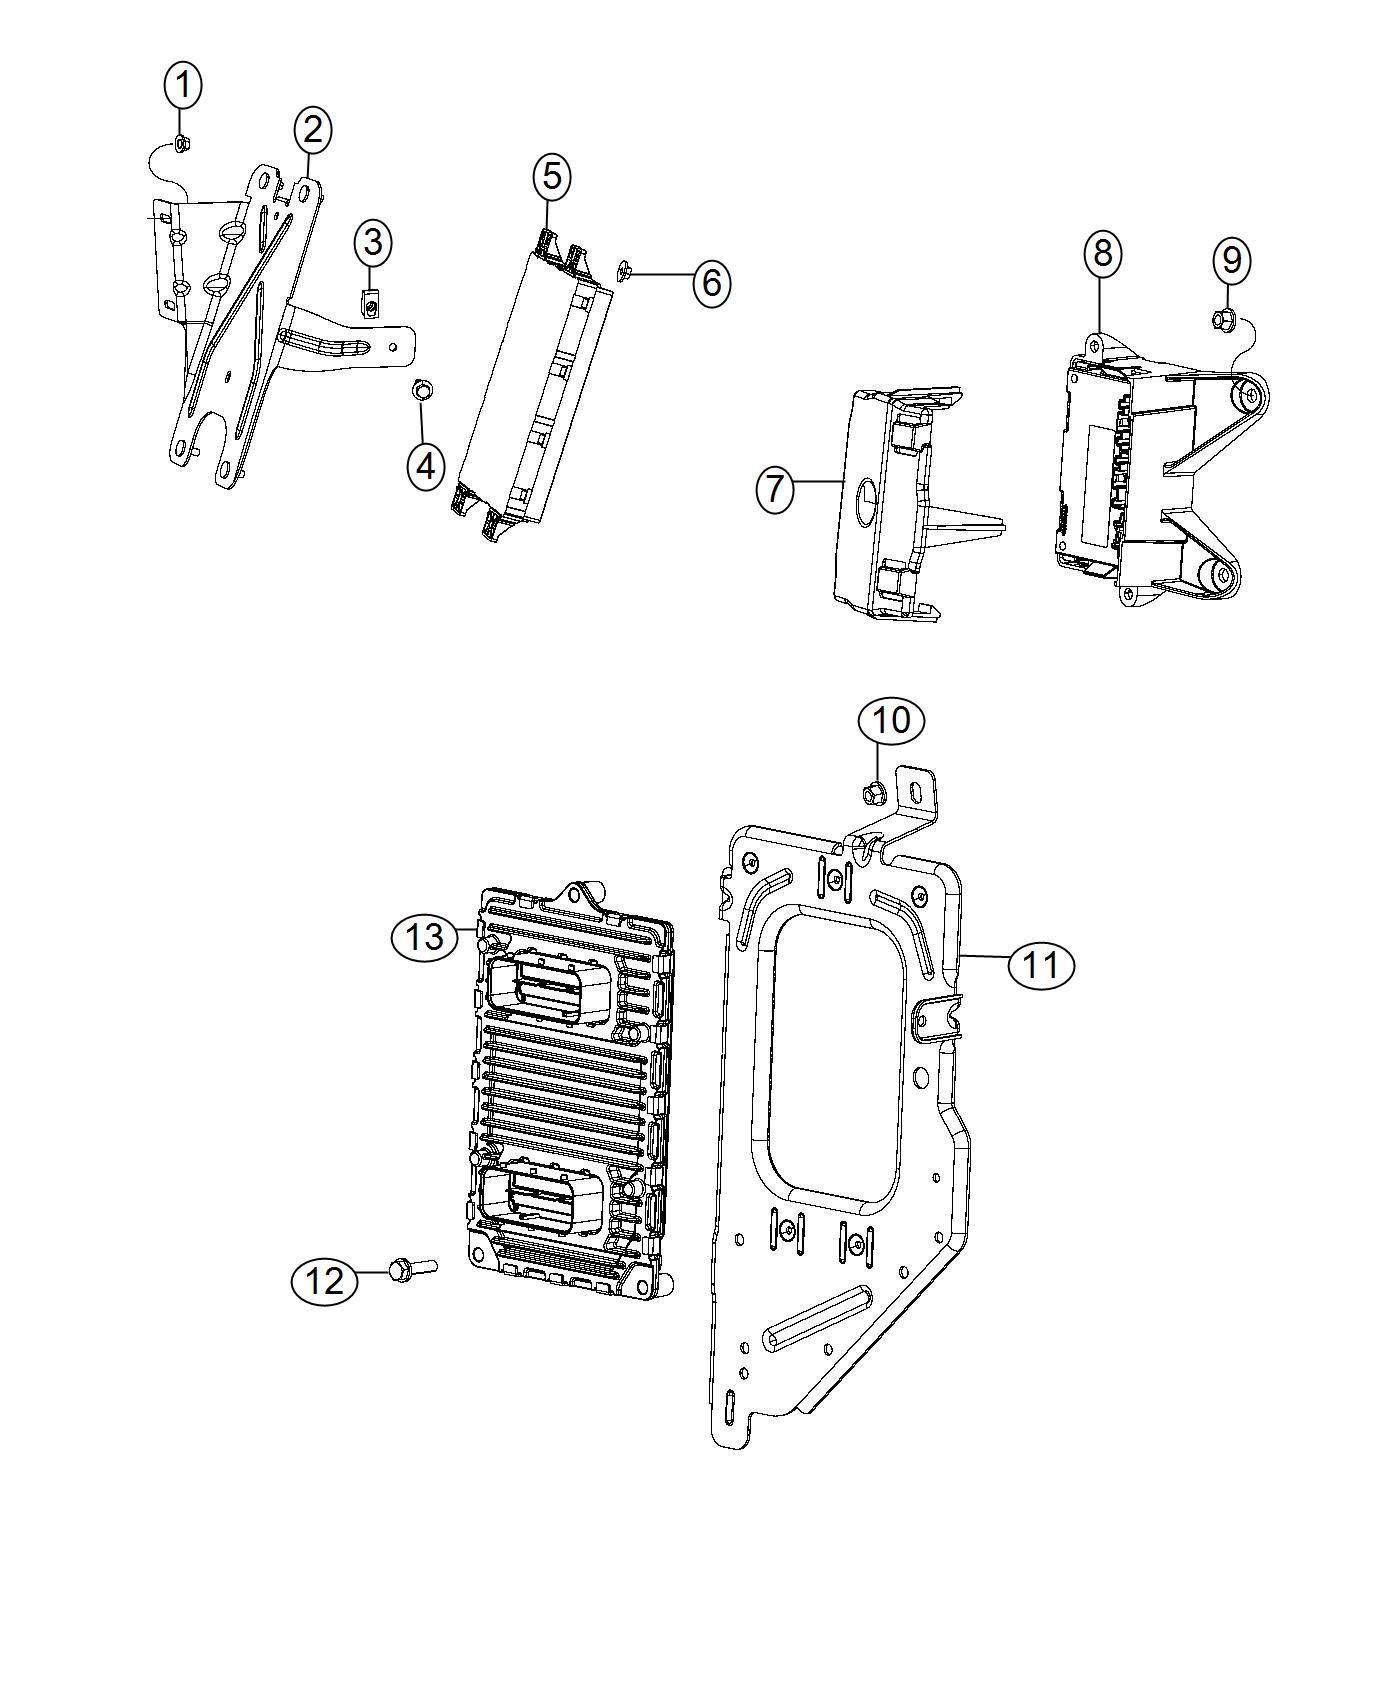 Ram 3500 Module. Engine controller, powertrain control